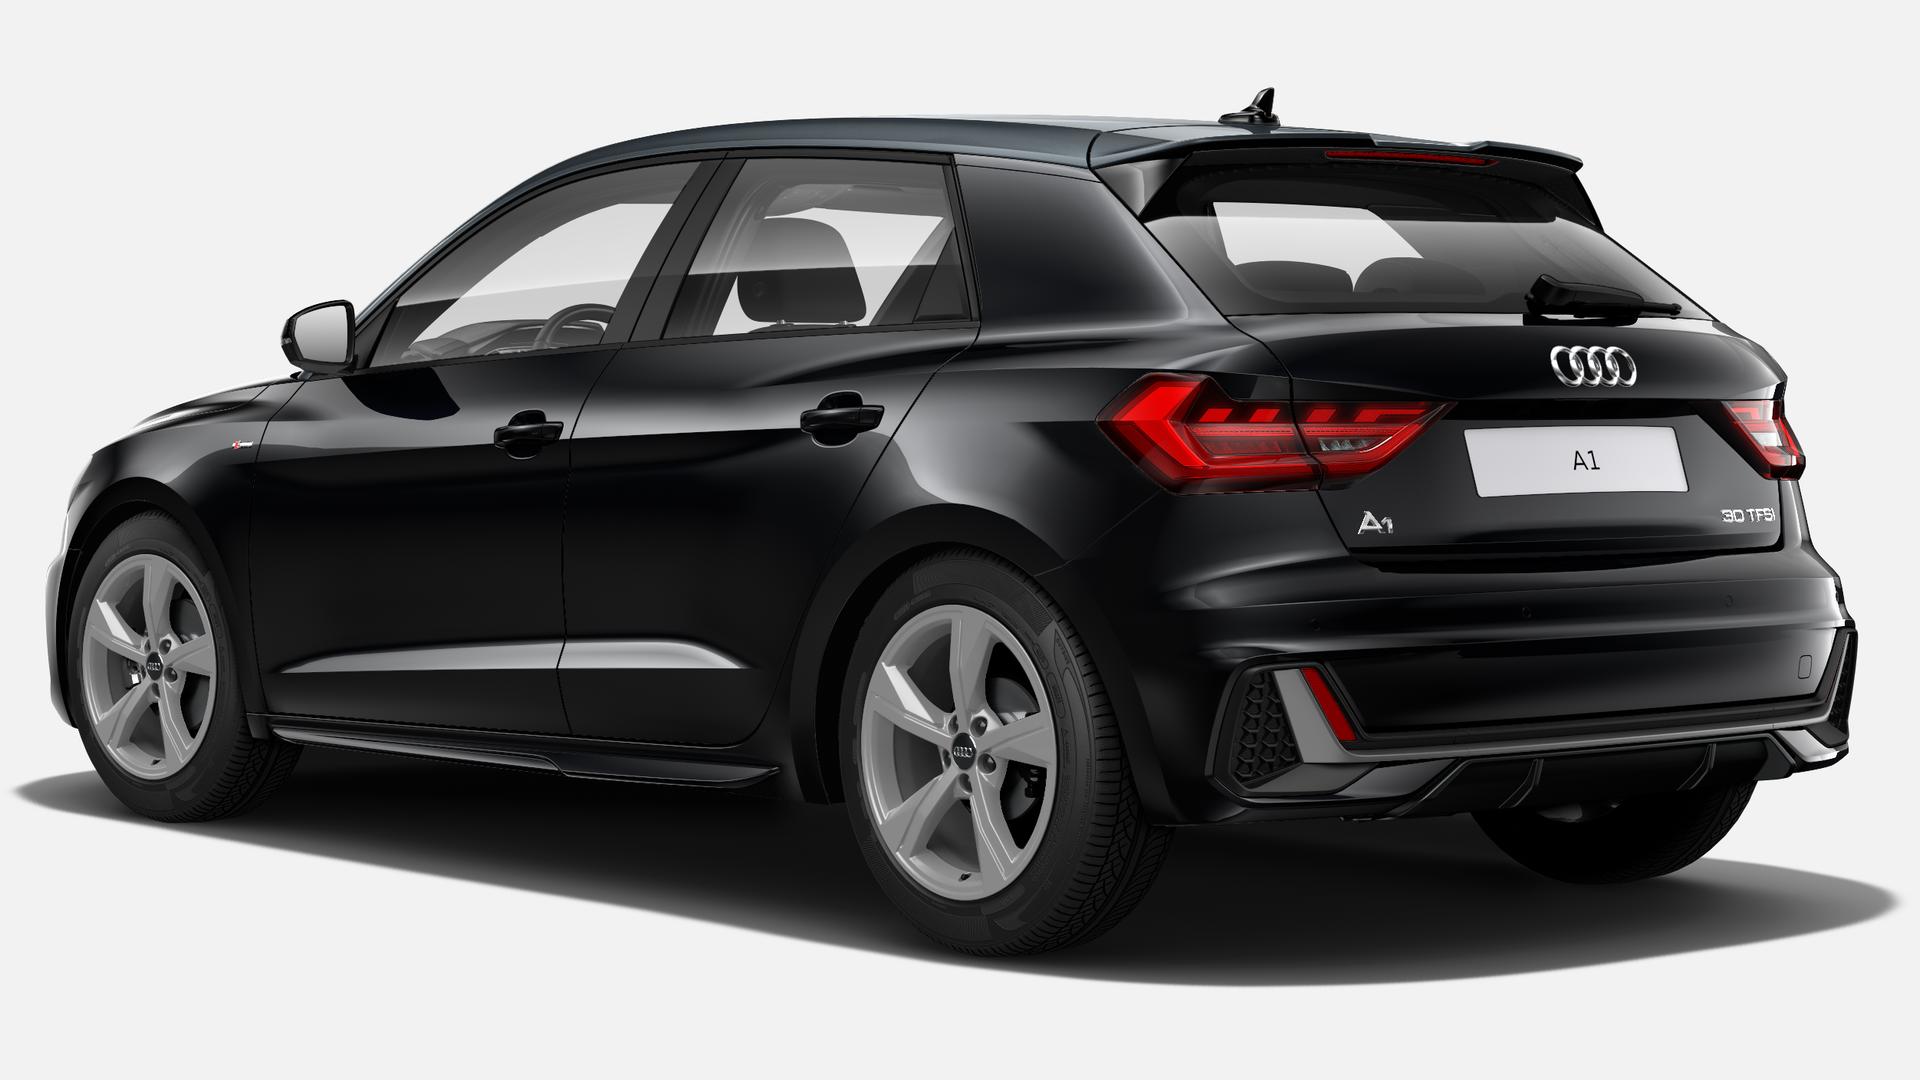 Vista Tres cuartos trasera izquierda de Audi A1 Sportback 30 TFSI S Line  85 kW (116 CV)